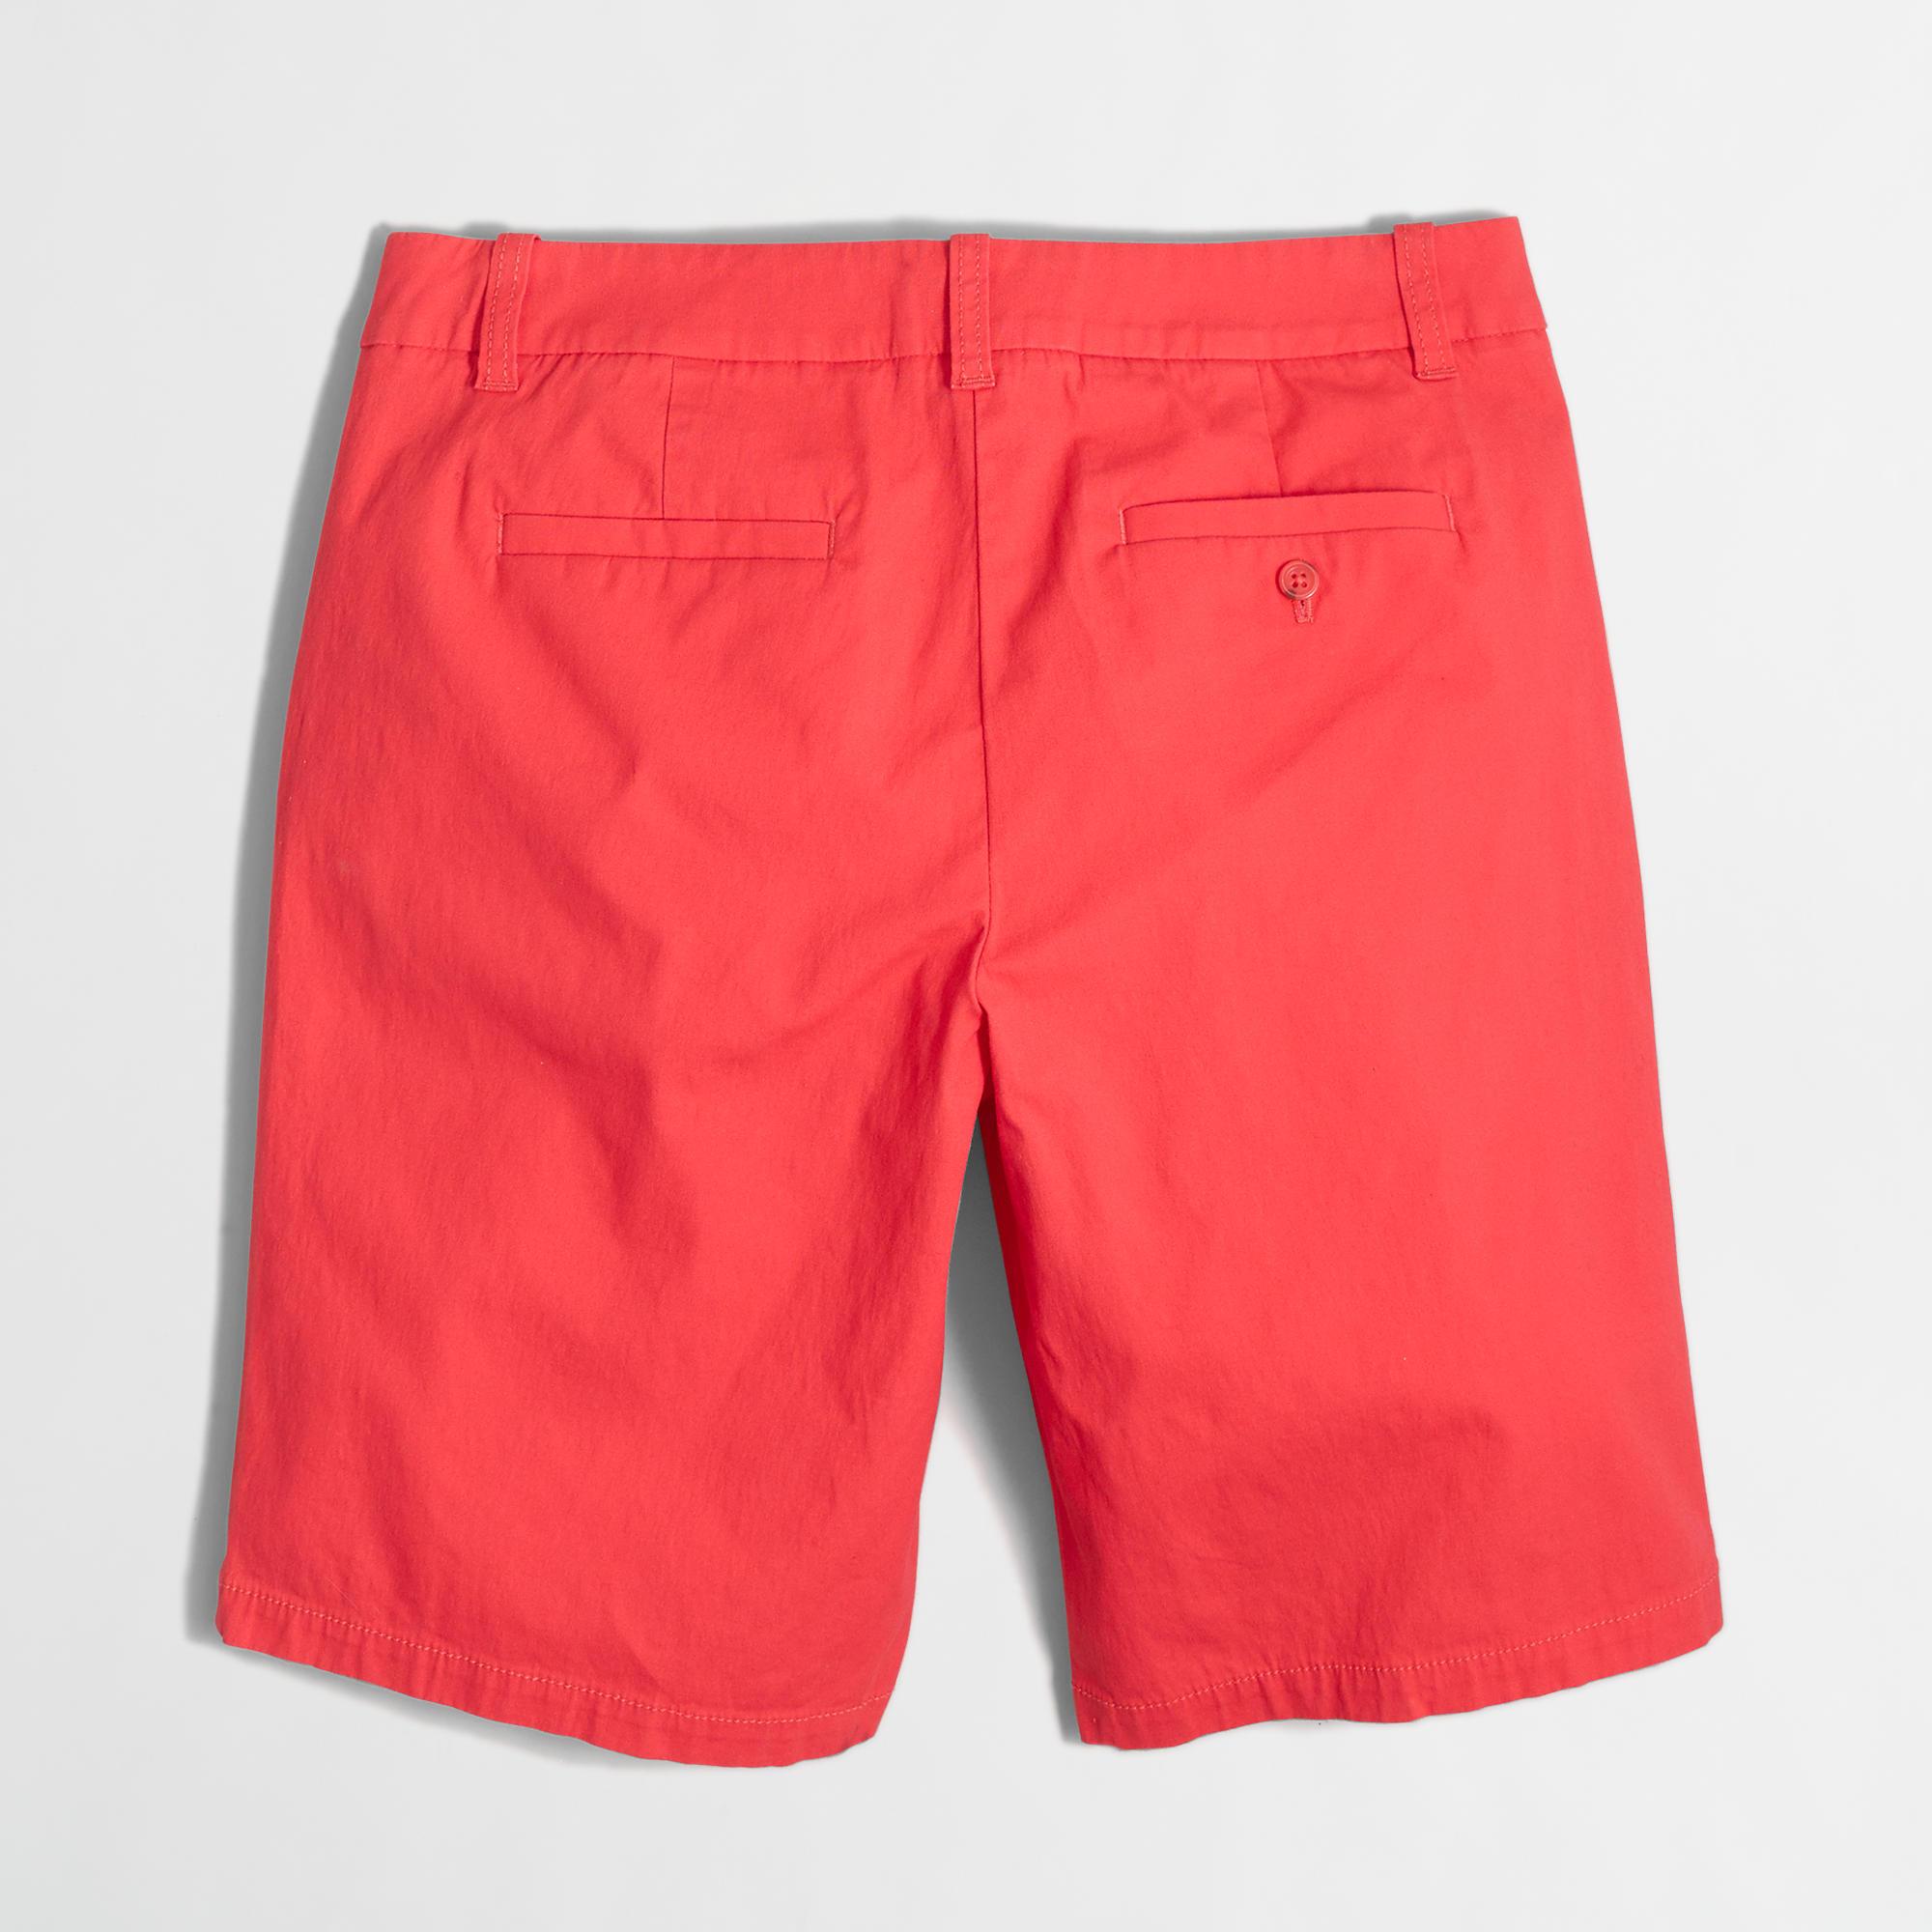 bermuda shorts 10 IIXBBIZ